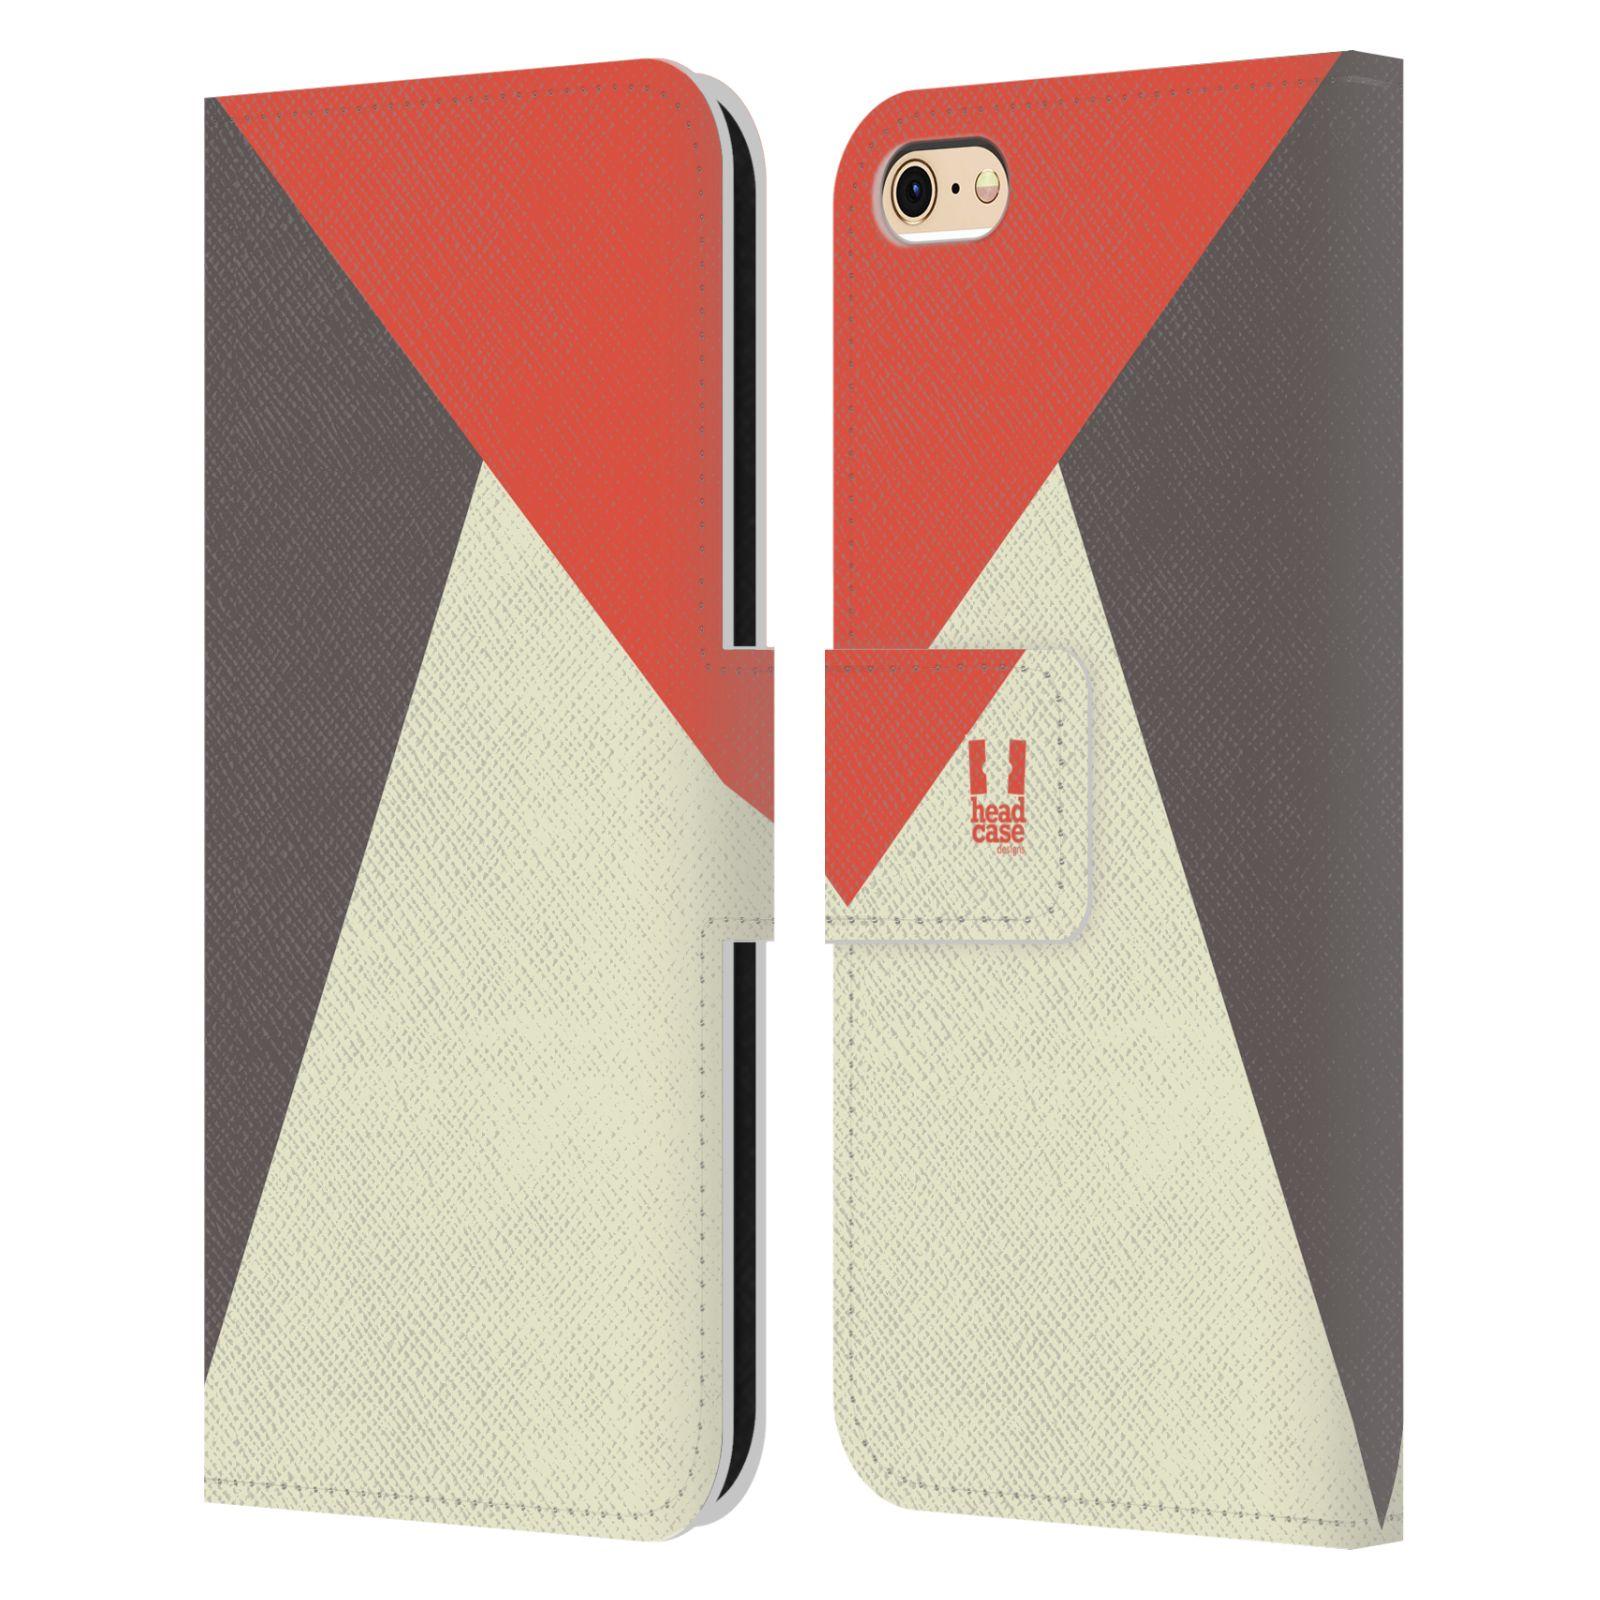 HEAD CASE Flipové pouzdro pro mobil Apple Iphone 6/6s barevné tvary červená a šedá COOL